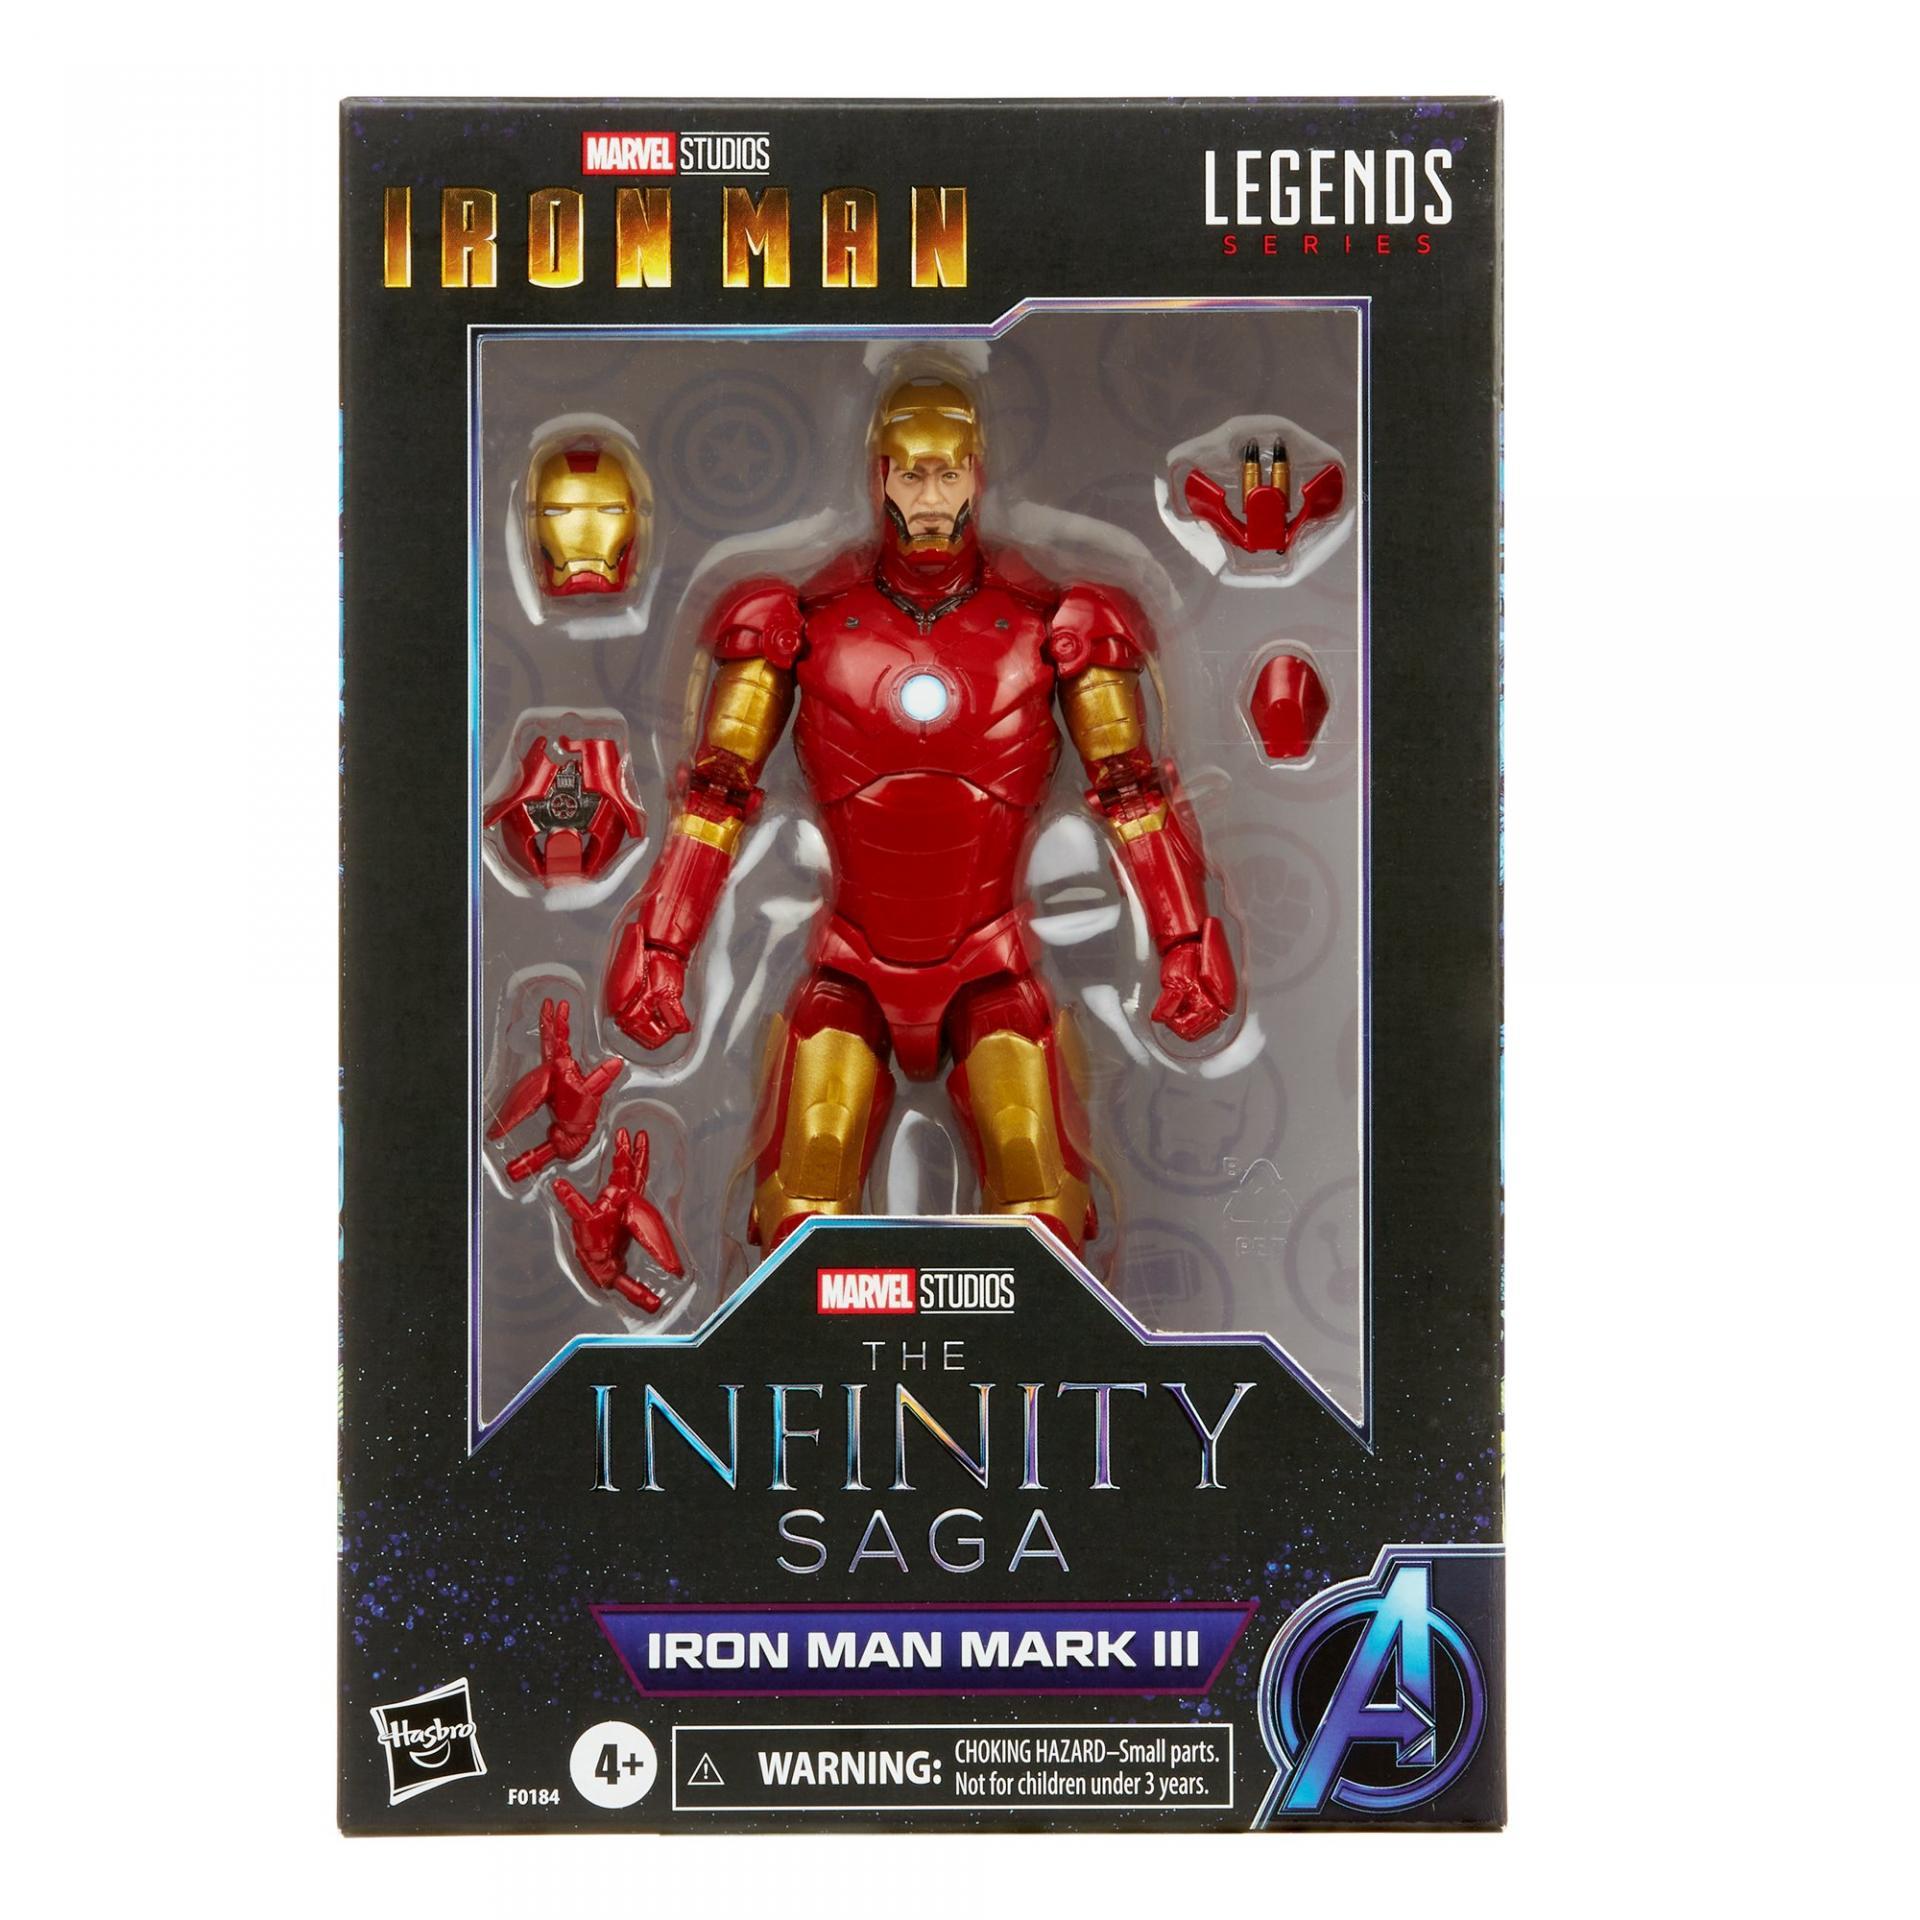 Marvel legends series hasbro iron man mark 3